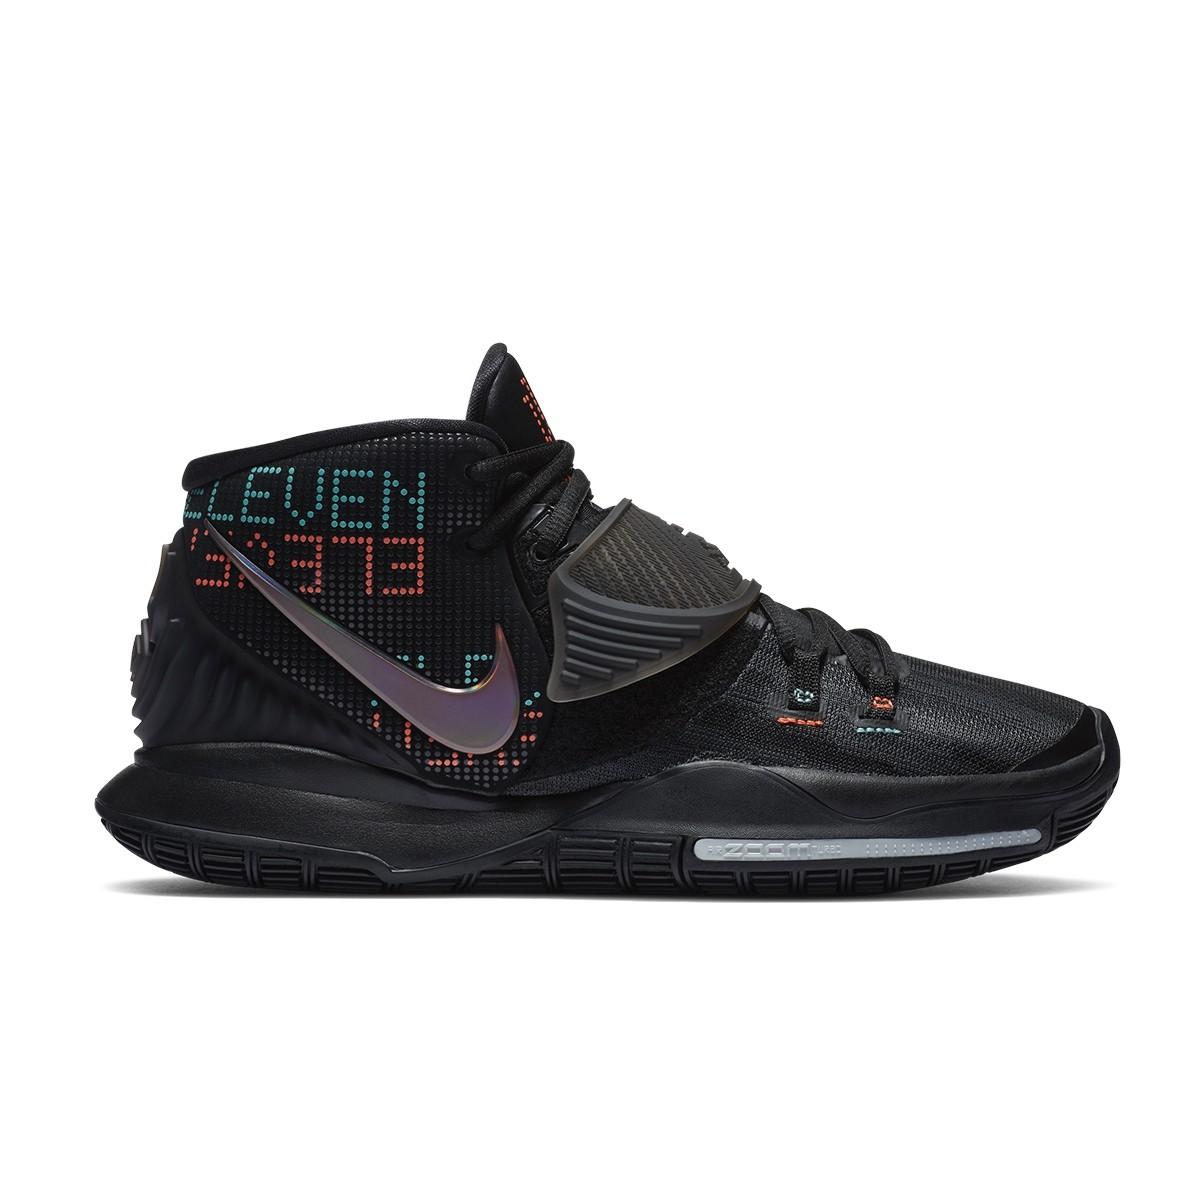 Nike Kyrie 6 'Shock Clock'